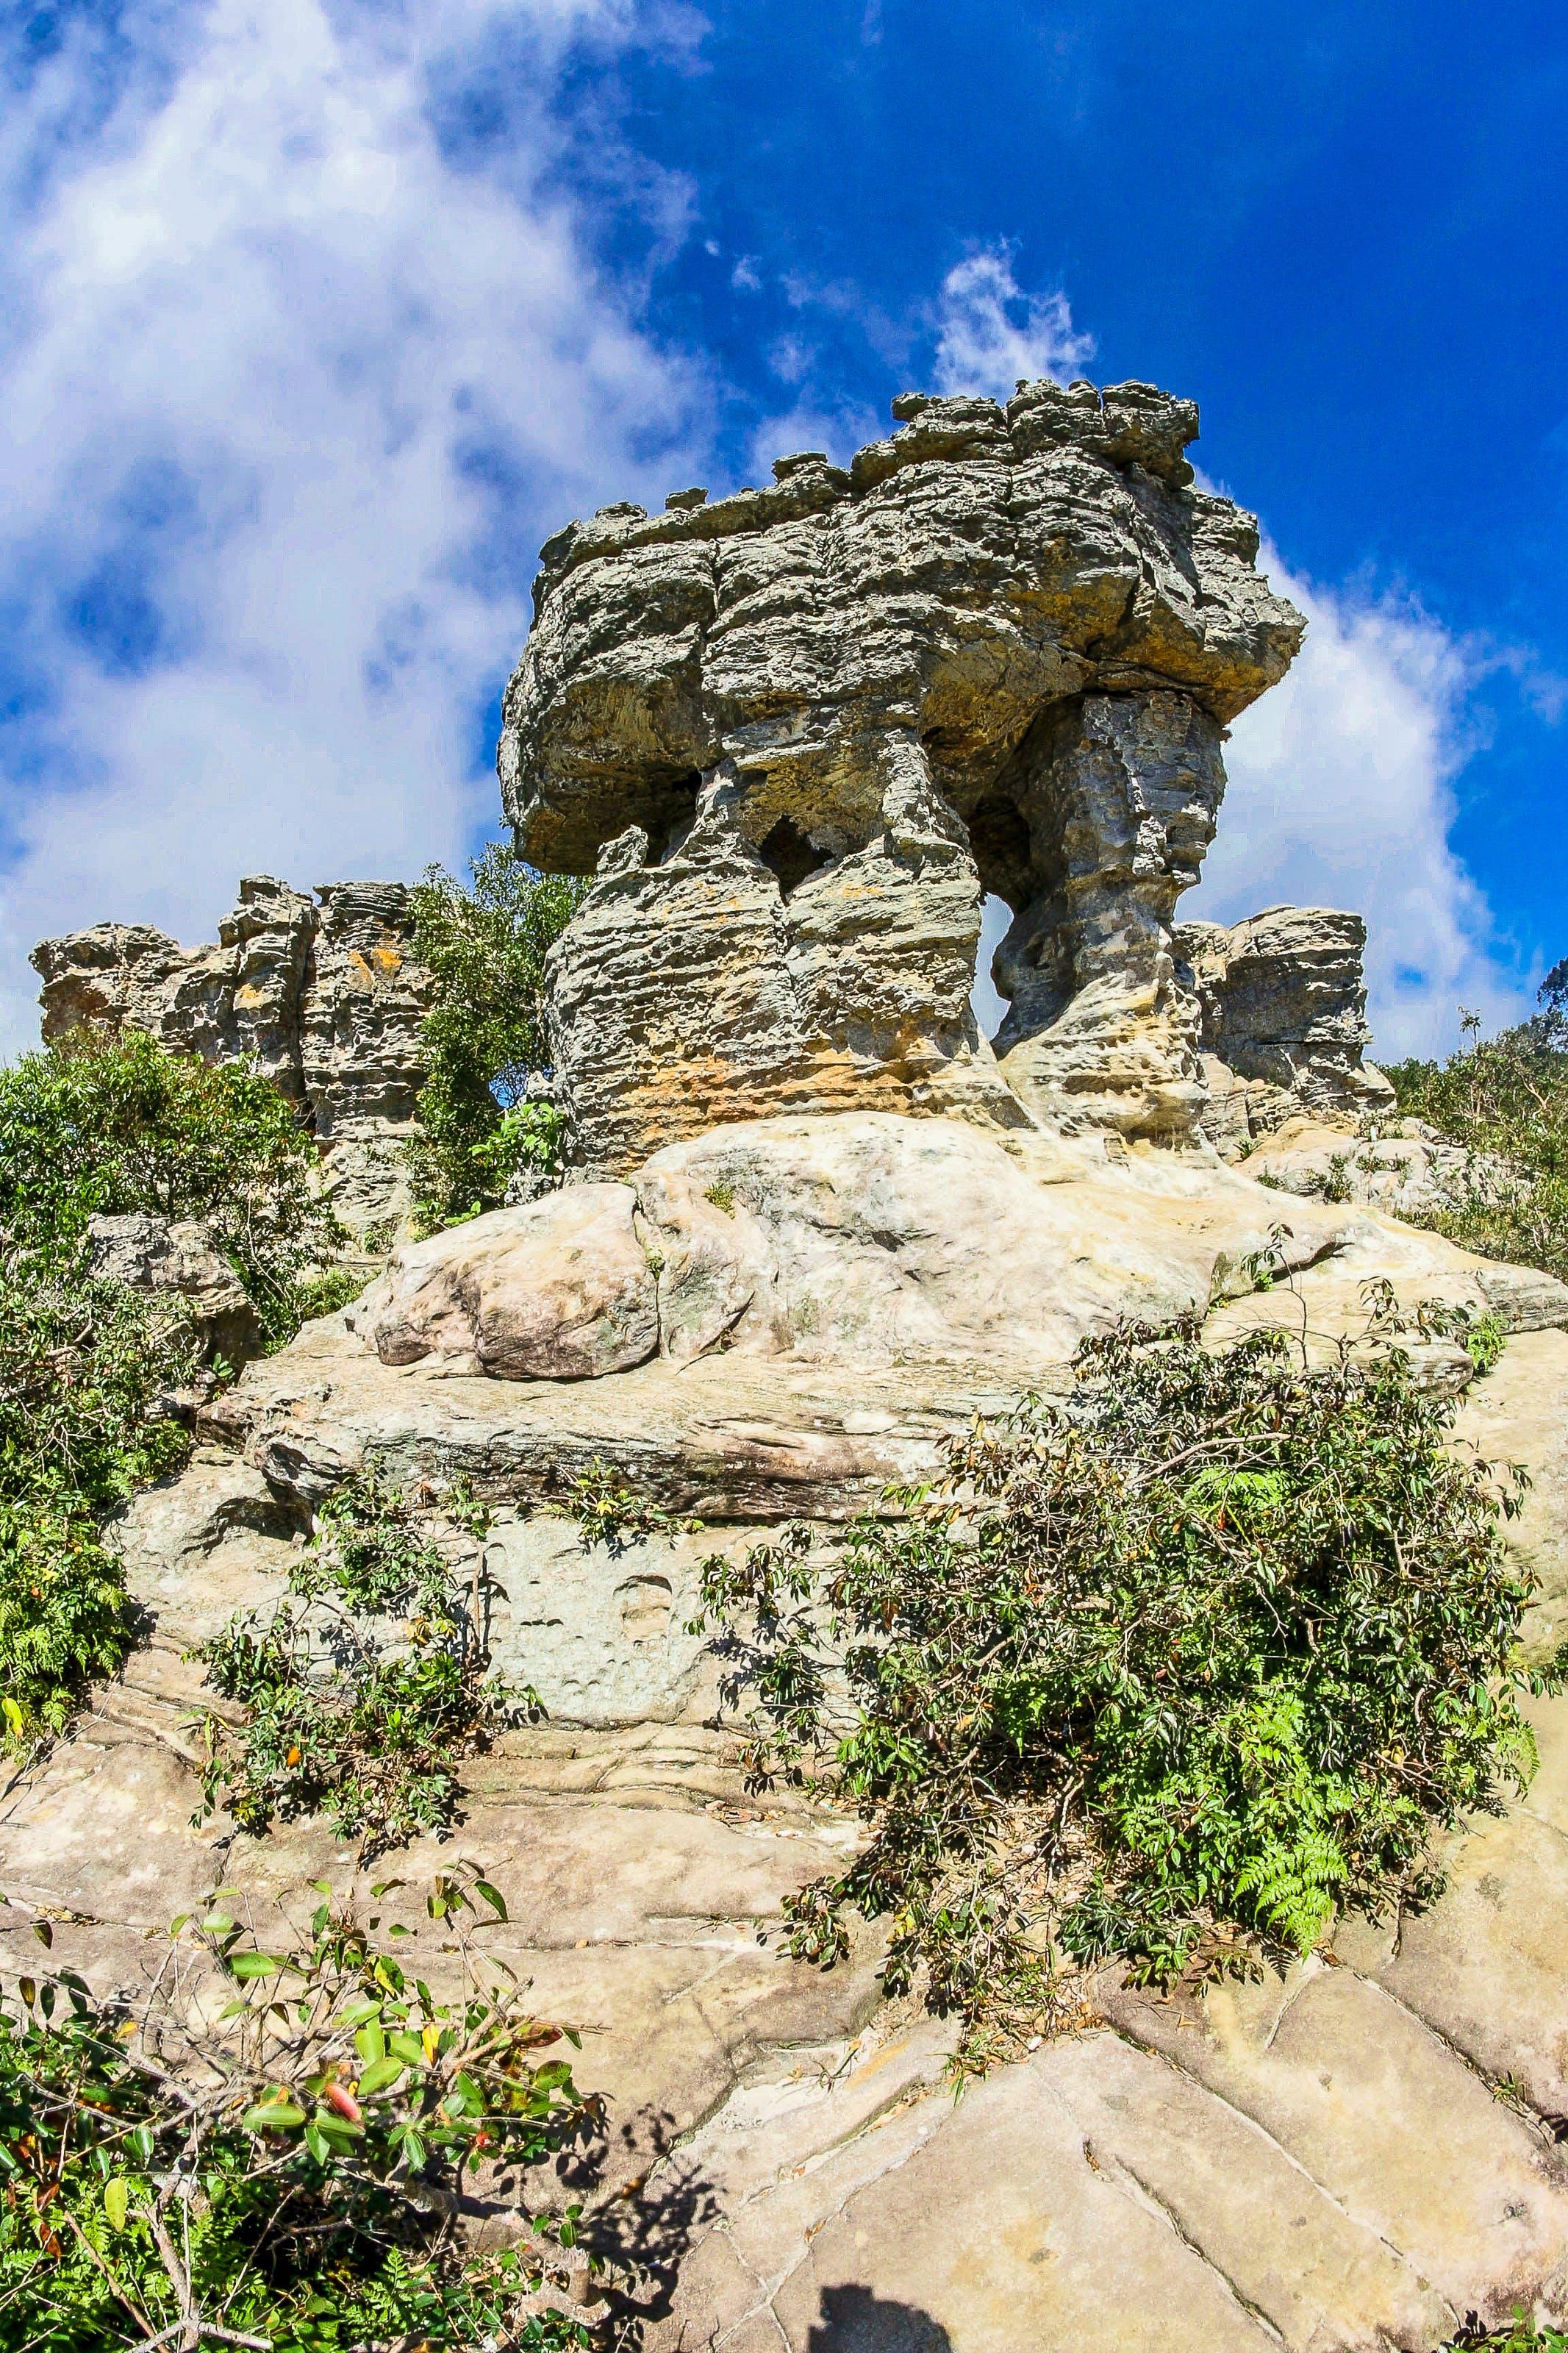 Free stock photo of landscape, nature, vacation, landmark